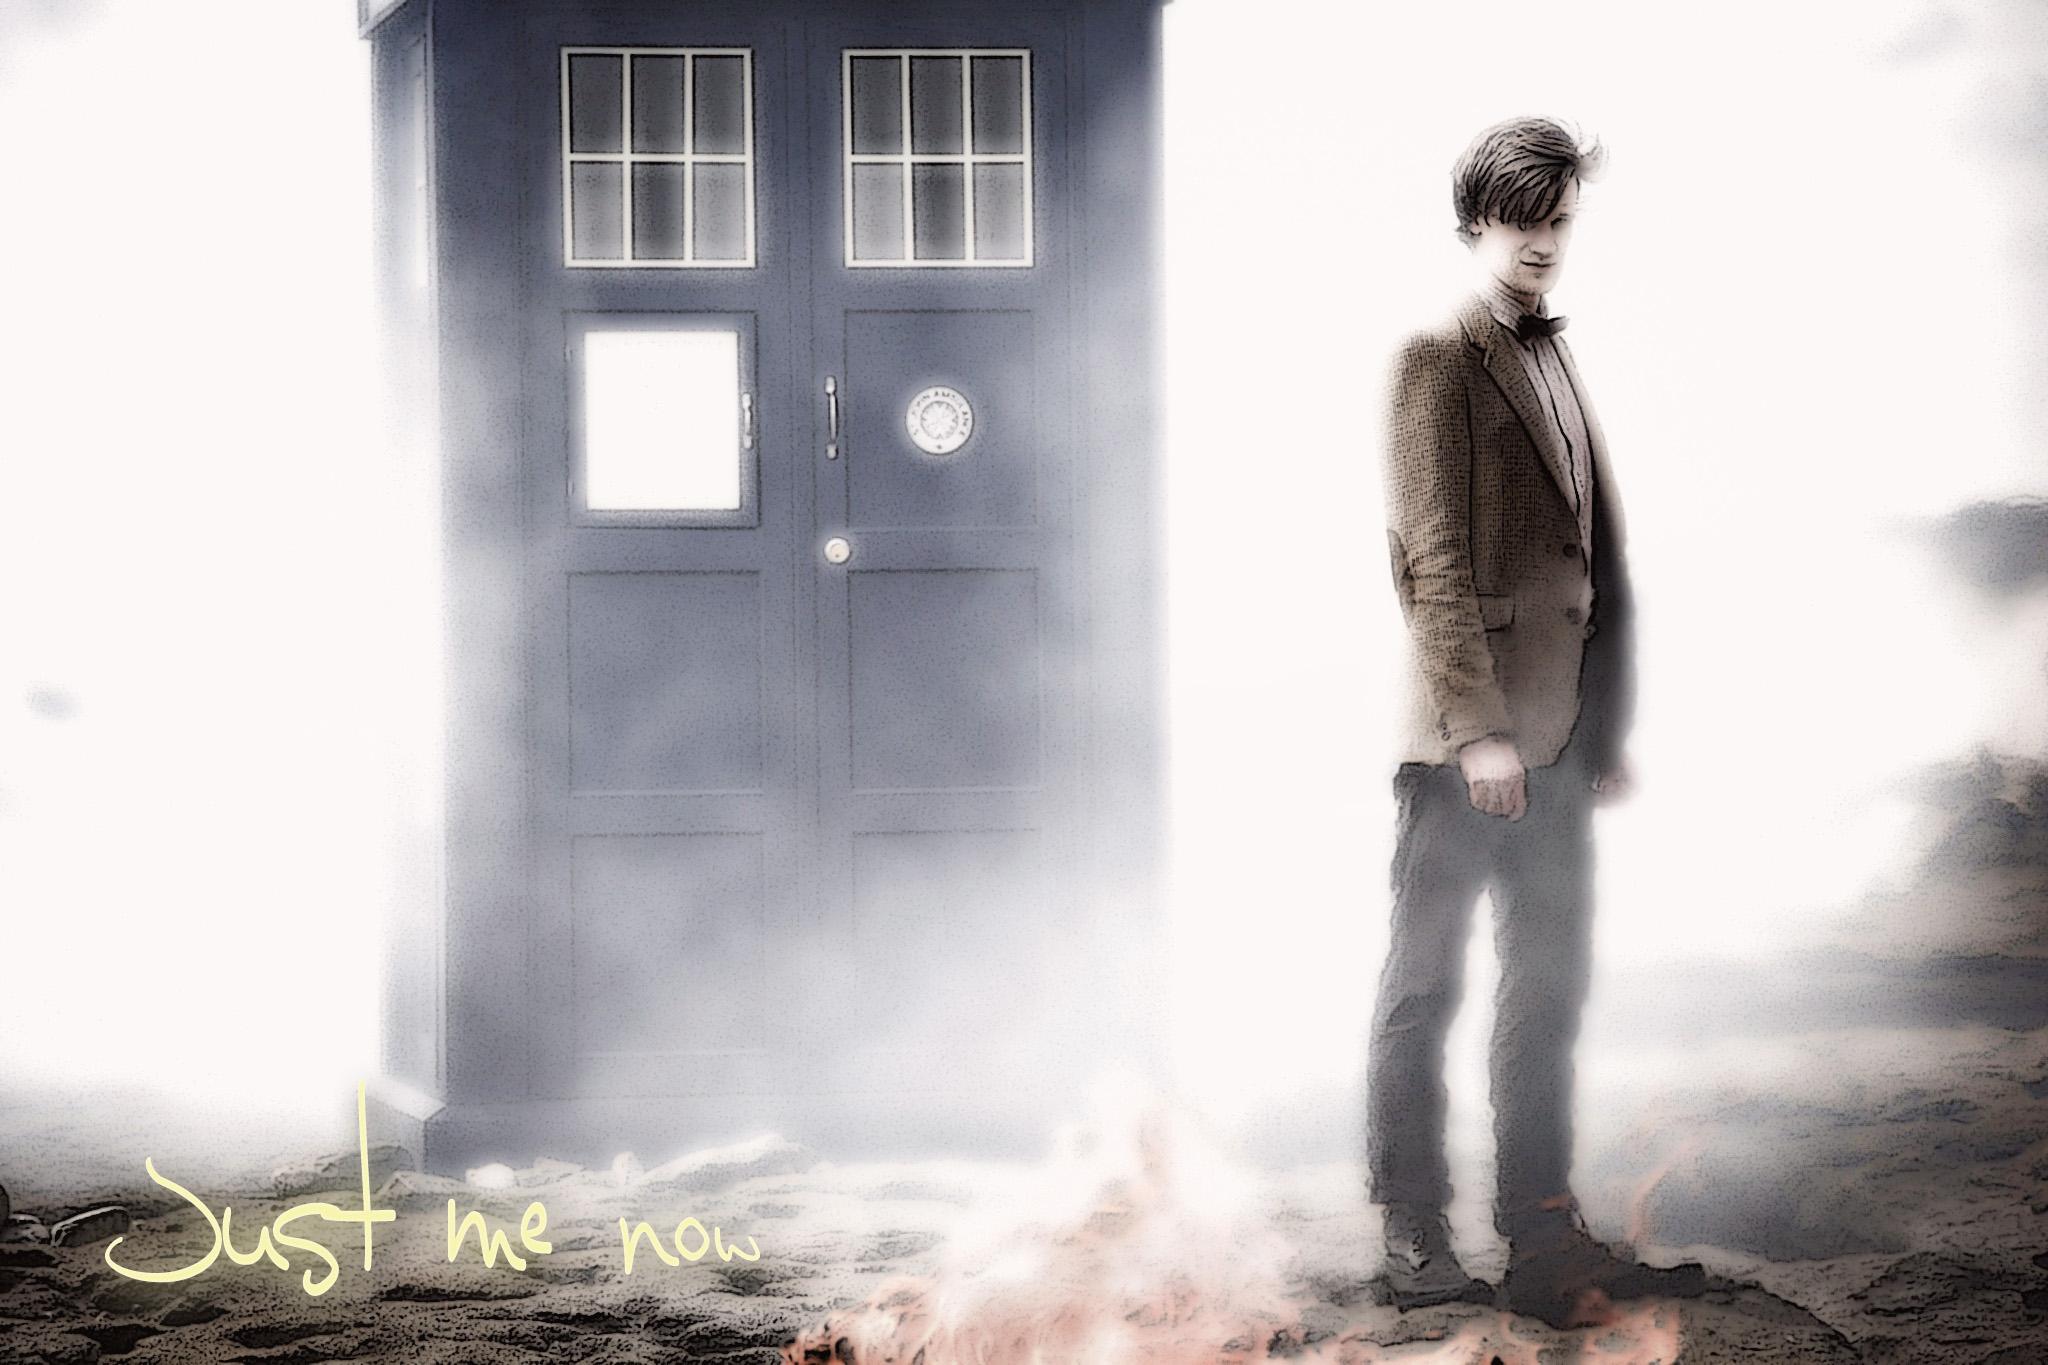 Doctor Who Wallpaper Matt Smith Tardis Tardis matt wallpaper 2048x1365